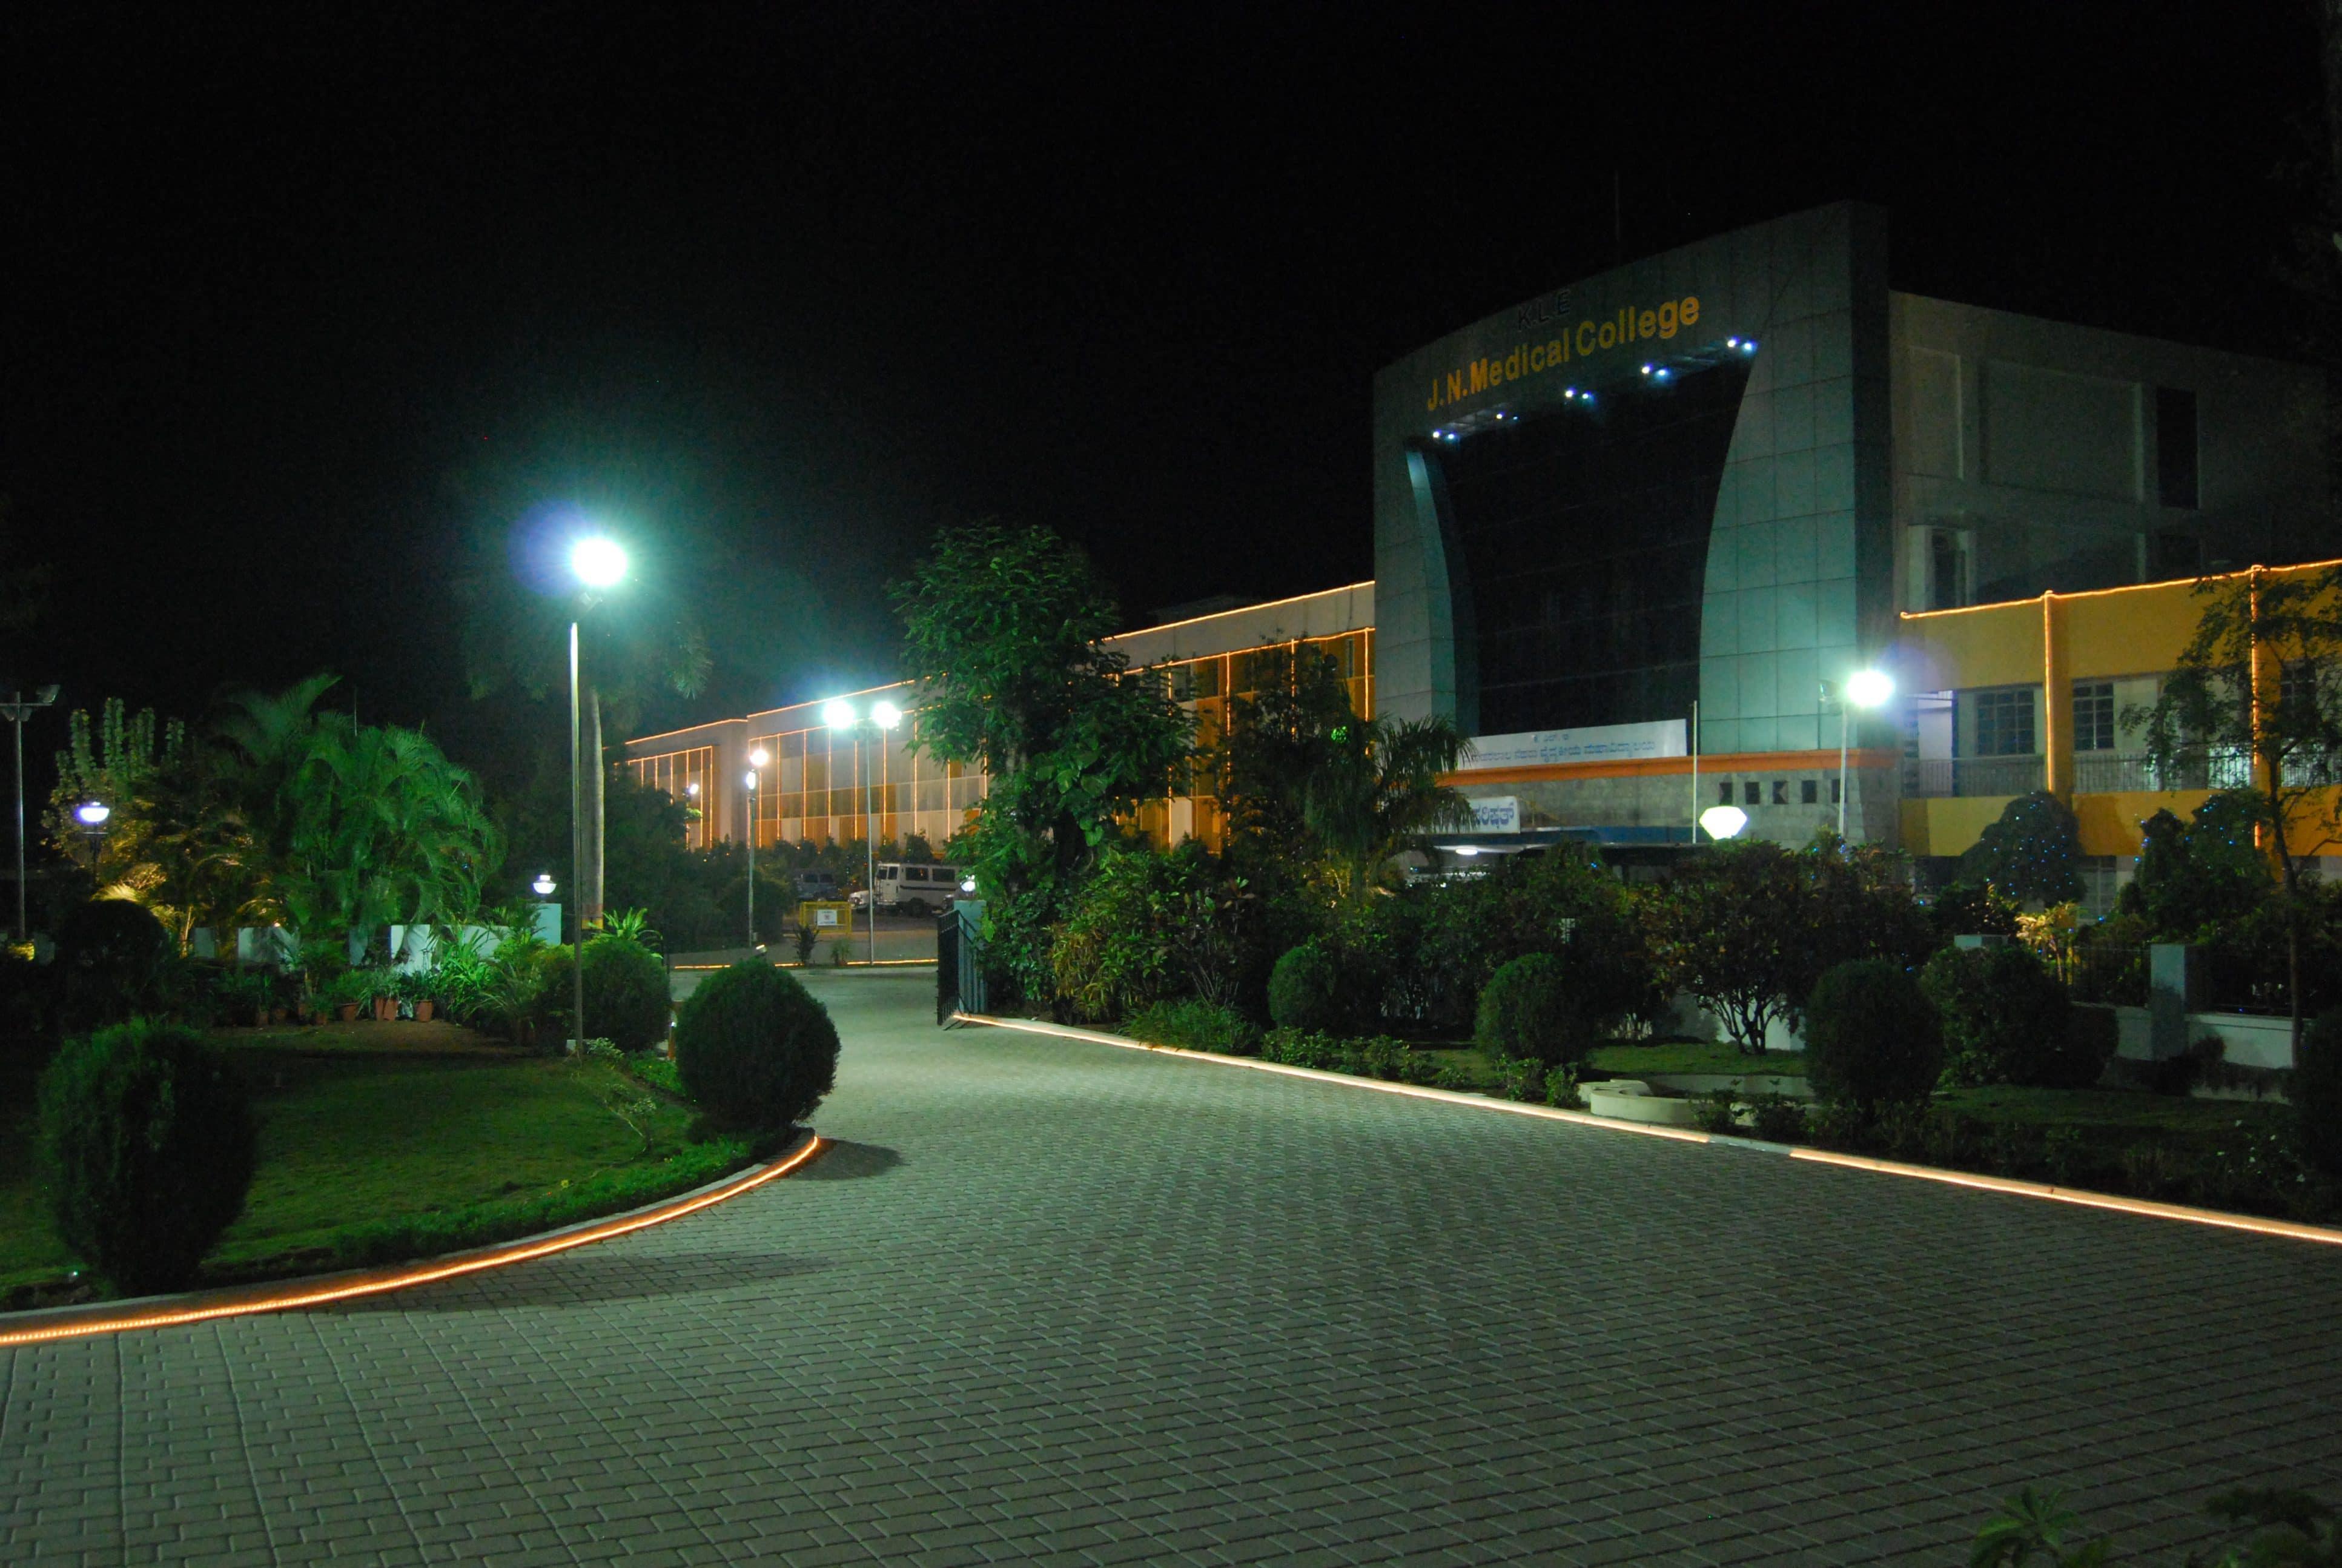 Jawaharlal Nehru Medical College (JNMC)